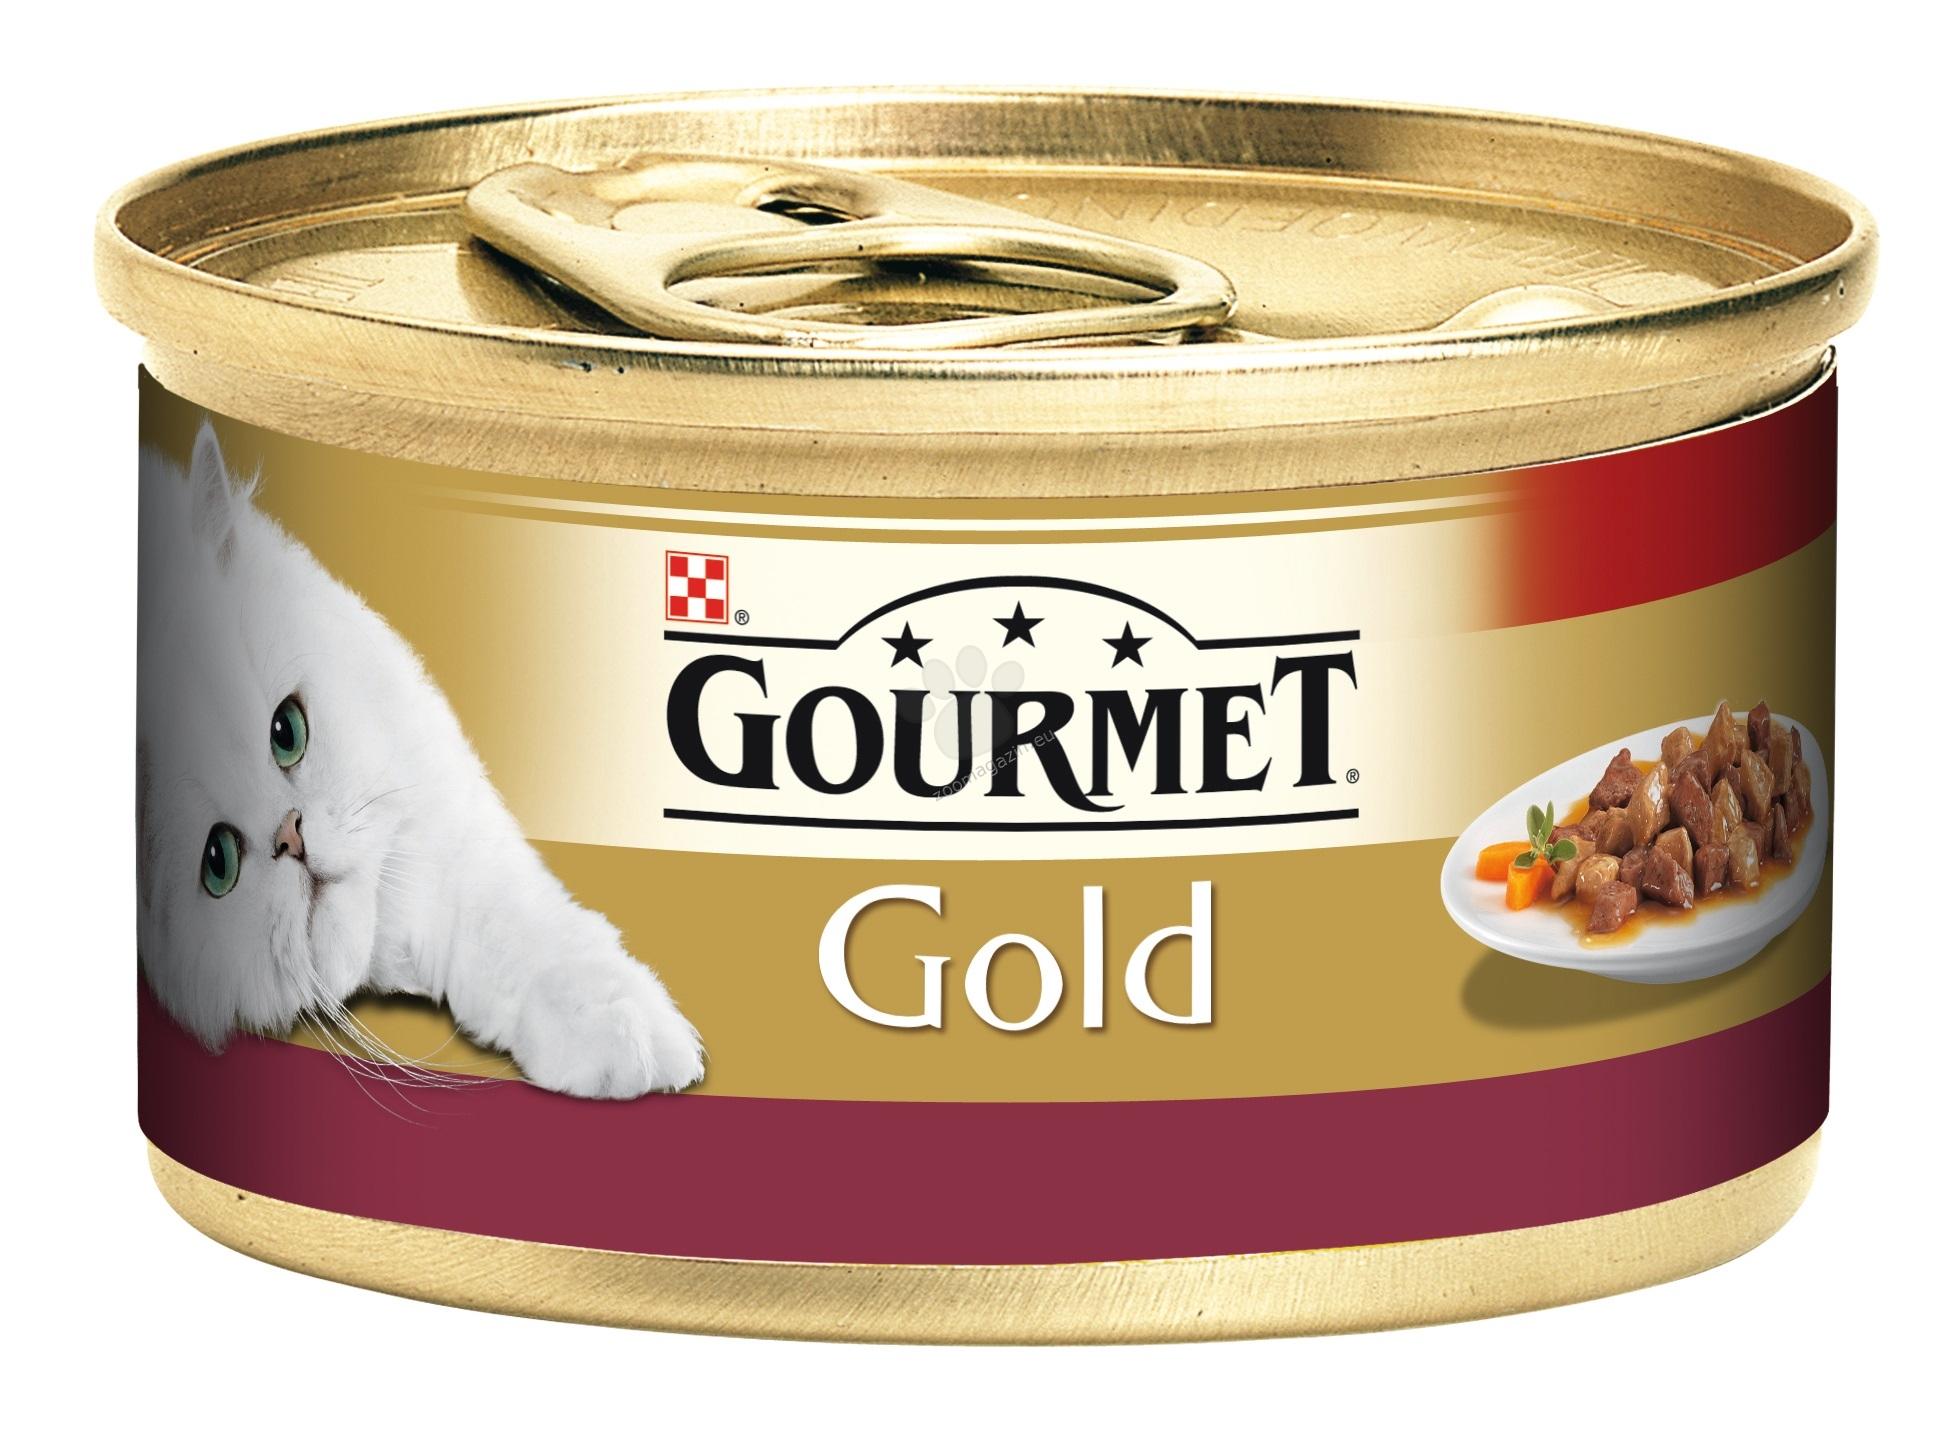 Gourmet Gold Morsels in Sauce Chicken Liver - месни хапки в сос пиле и черен дроб - 85 гр